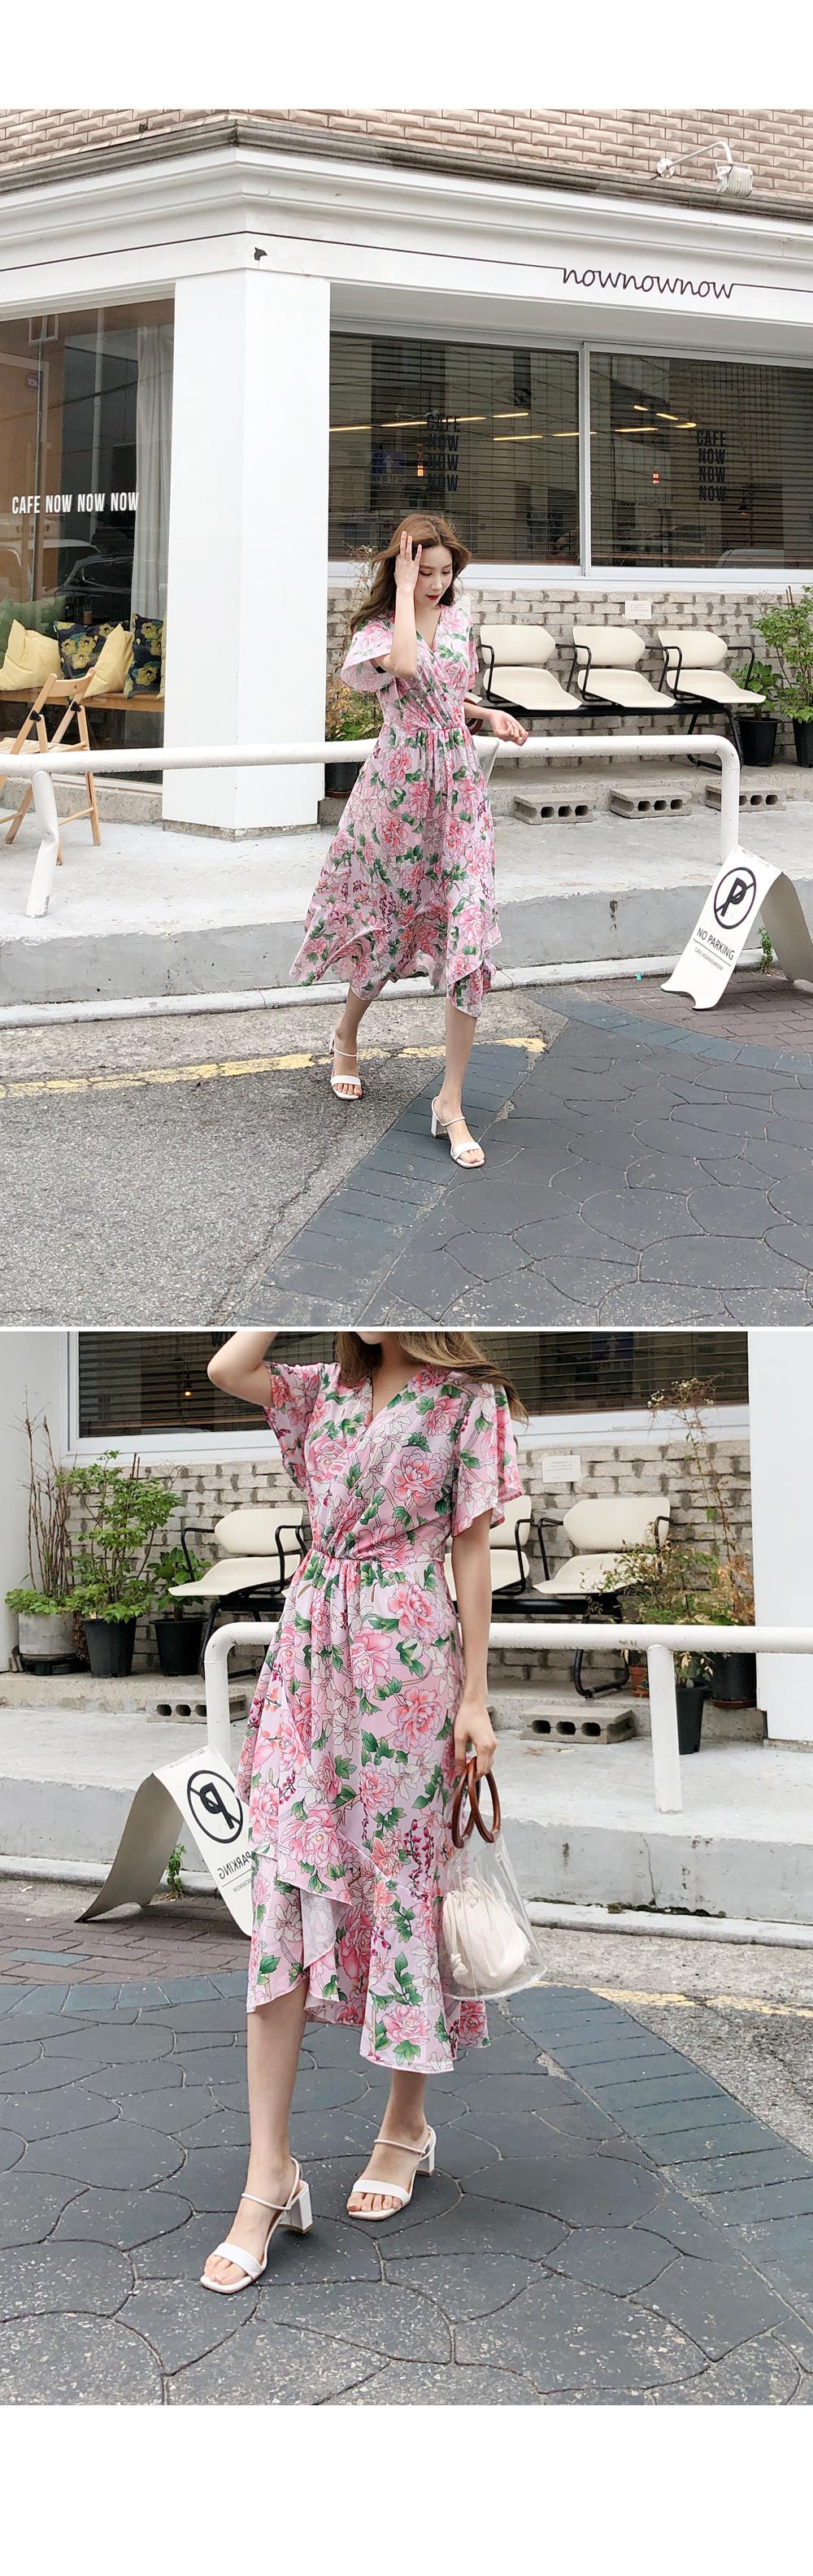 Flower Purple Dress One Piece